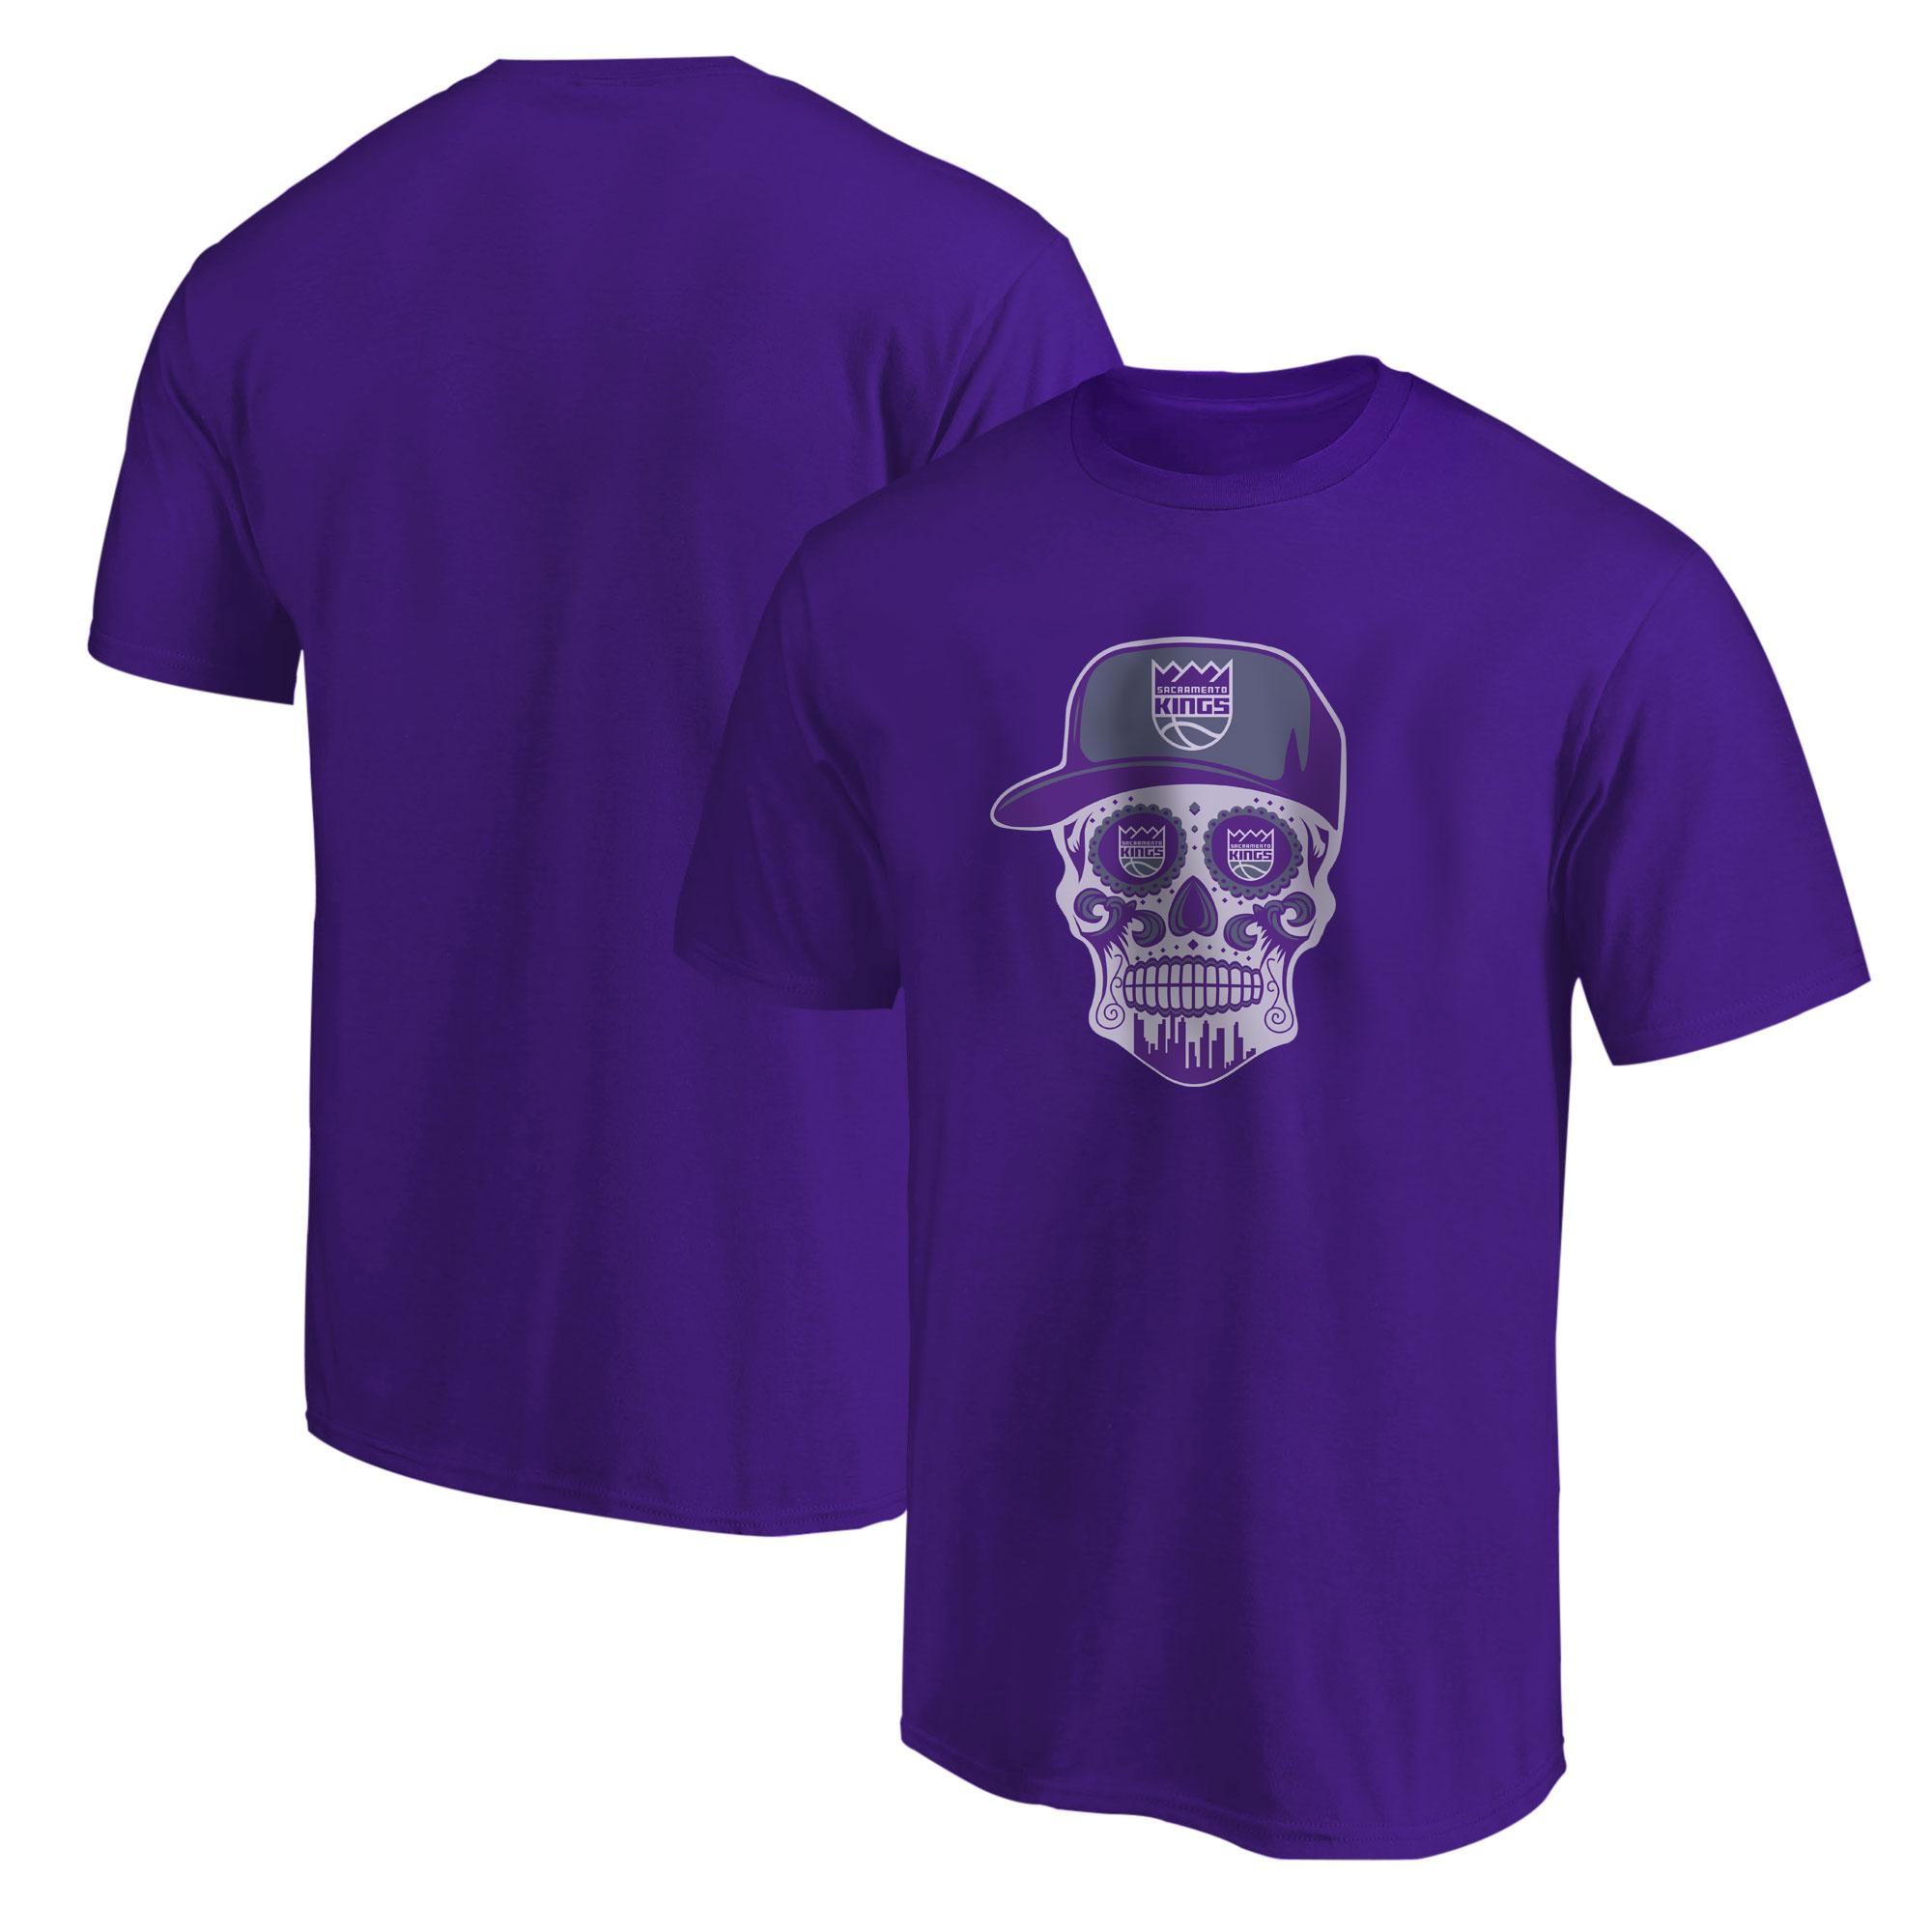 Sacramento Skull Tshirt (TSH-PRP-NP-463-SACRAMENTO-SKULL)